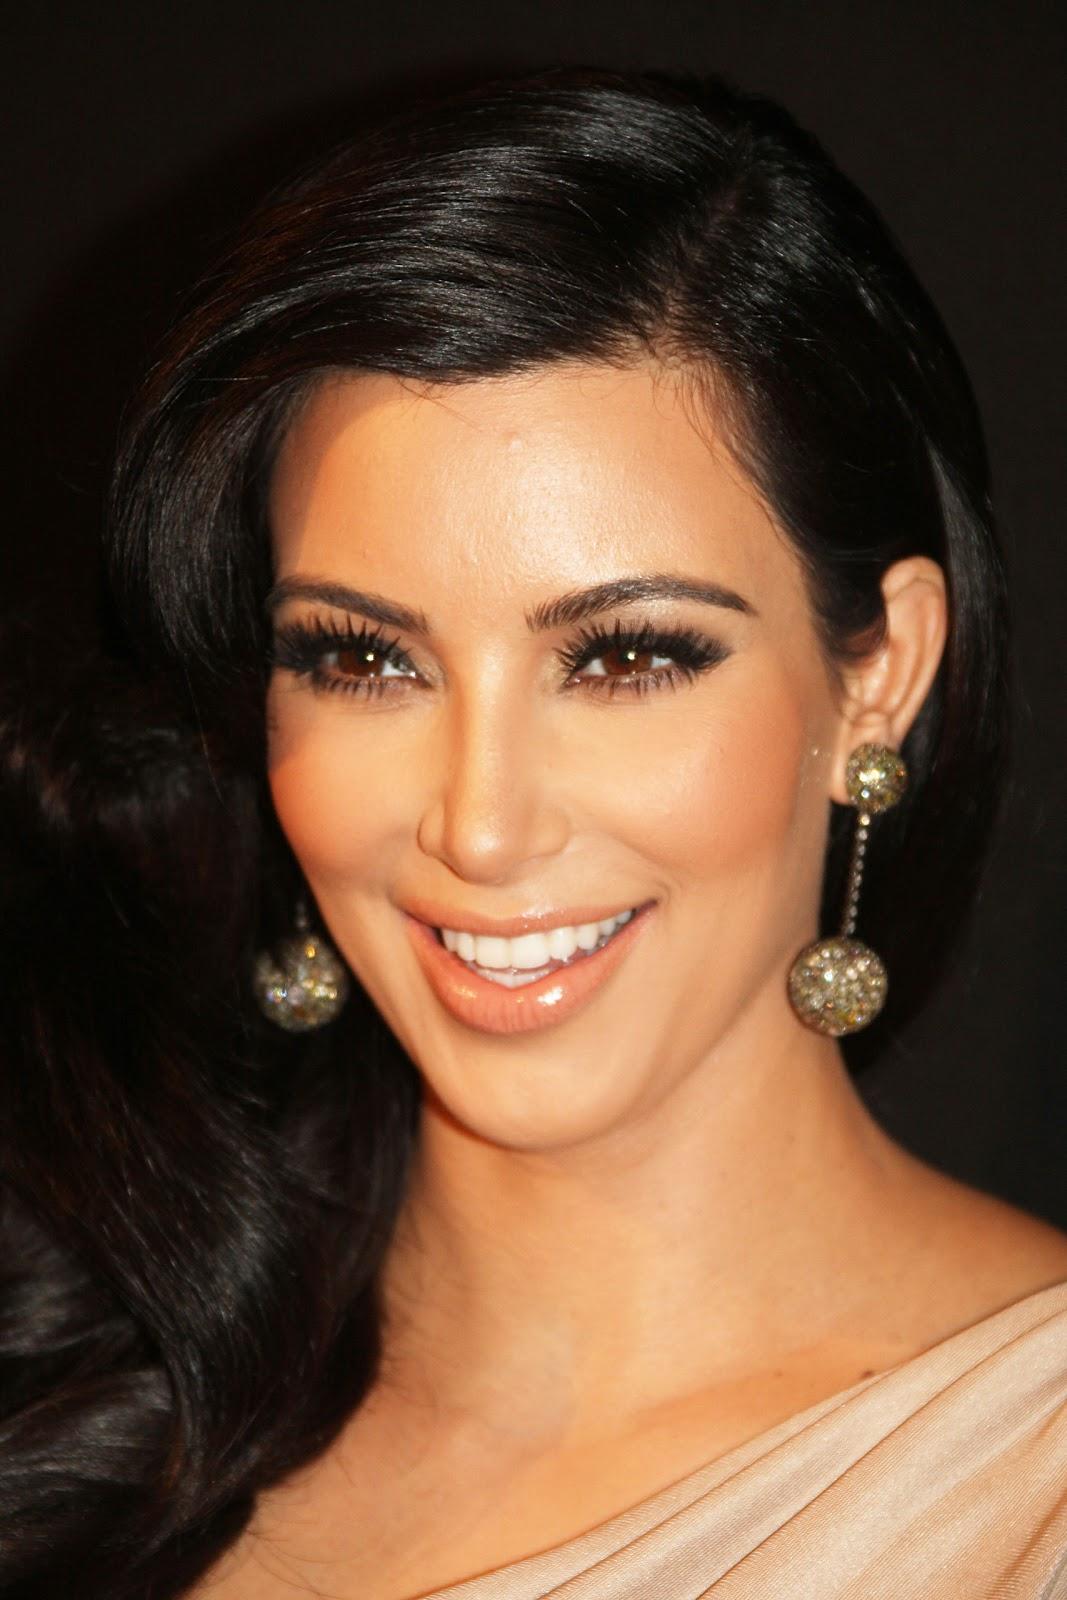 http://2.bp.blogspot.com/-As1eZ4HuFjI/T6LC-VvrkNI/AAAAAAAAAt8/0ejUBf9Nrxc/s1600/kim-kardashian-makeup.jpg